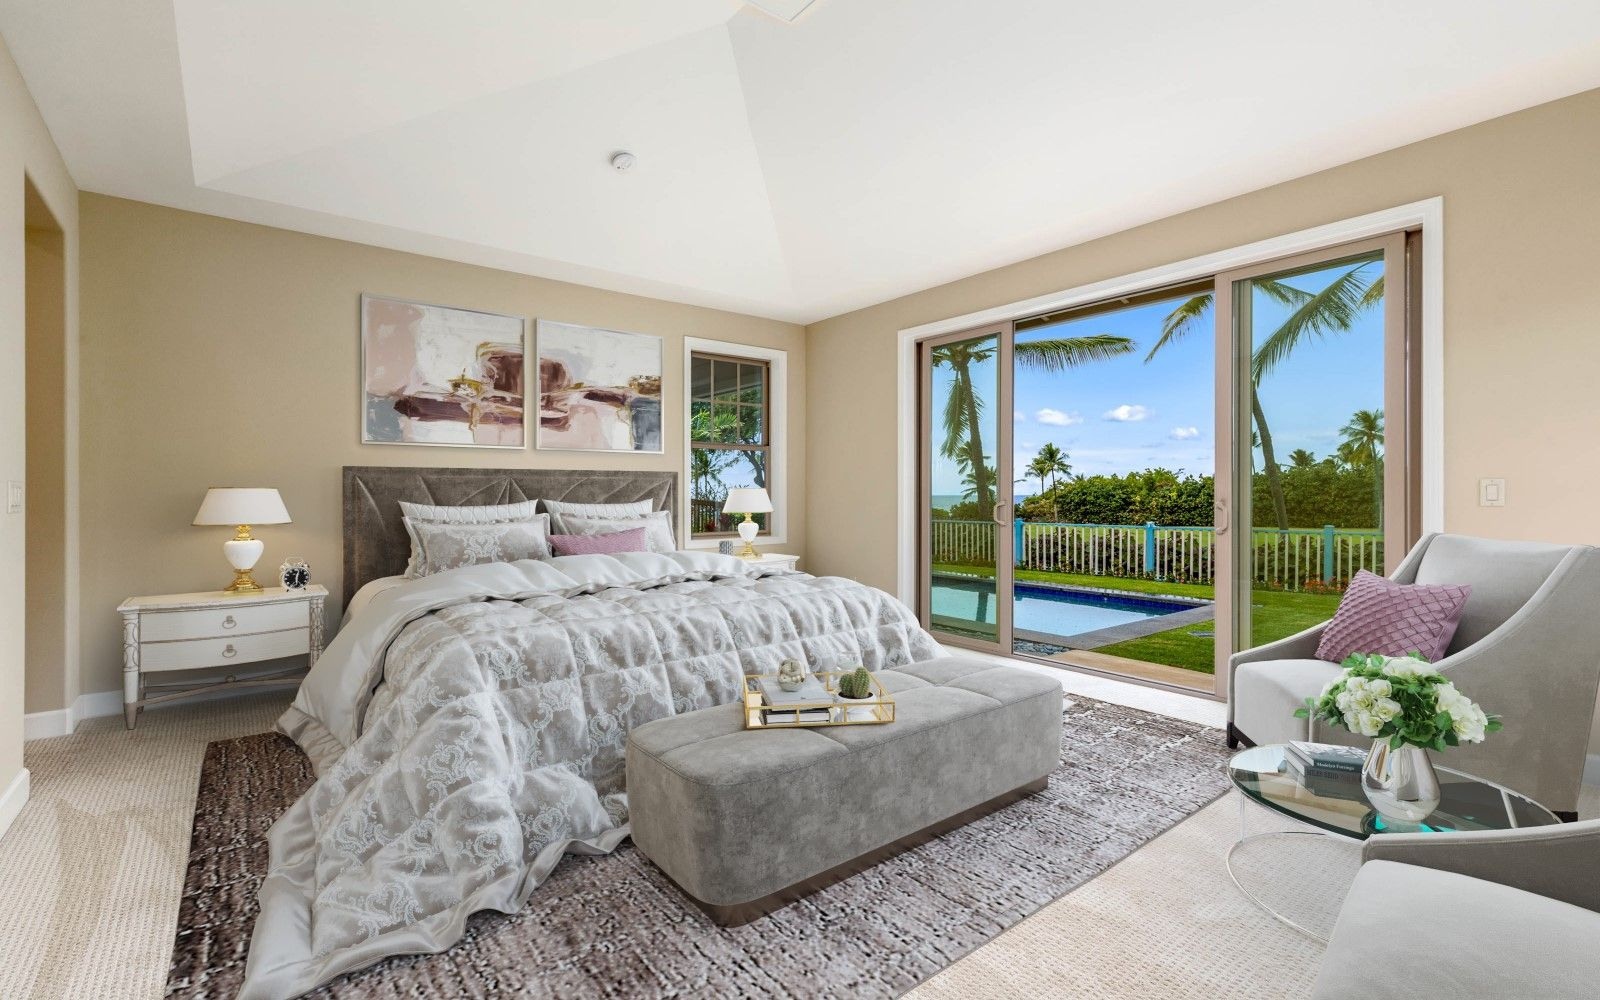 Bedroom featured in the Ehukai Plan 3 By Brookfield Residential in Hawaii Island, HI